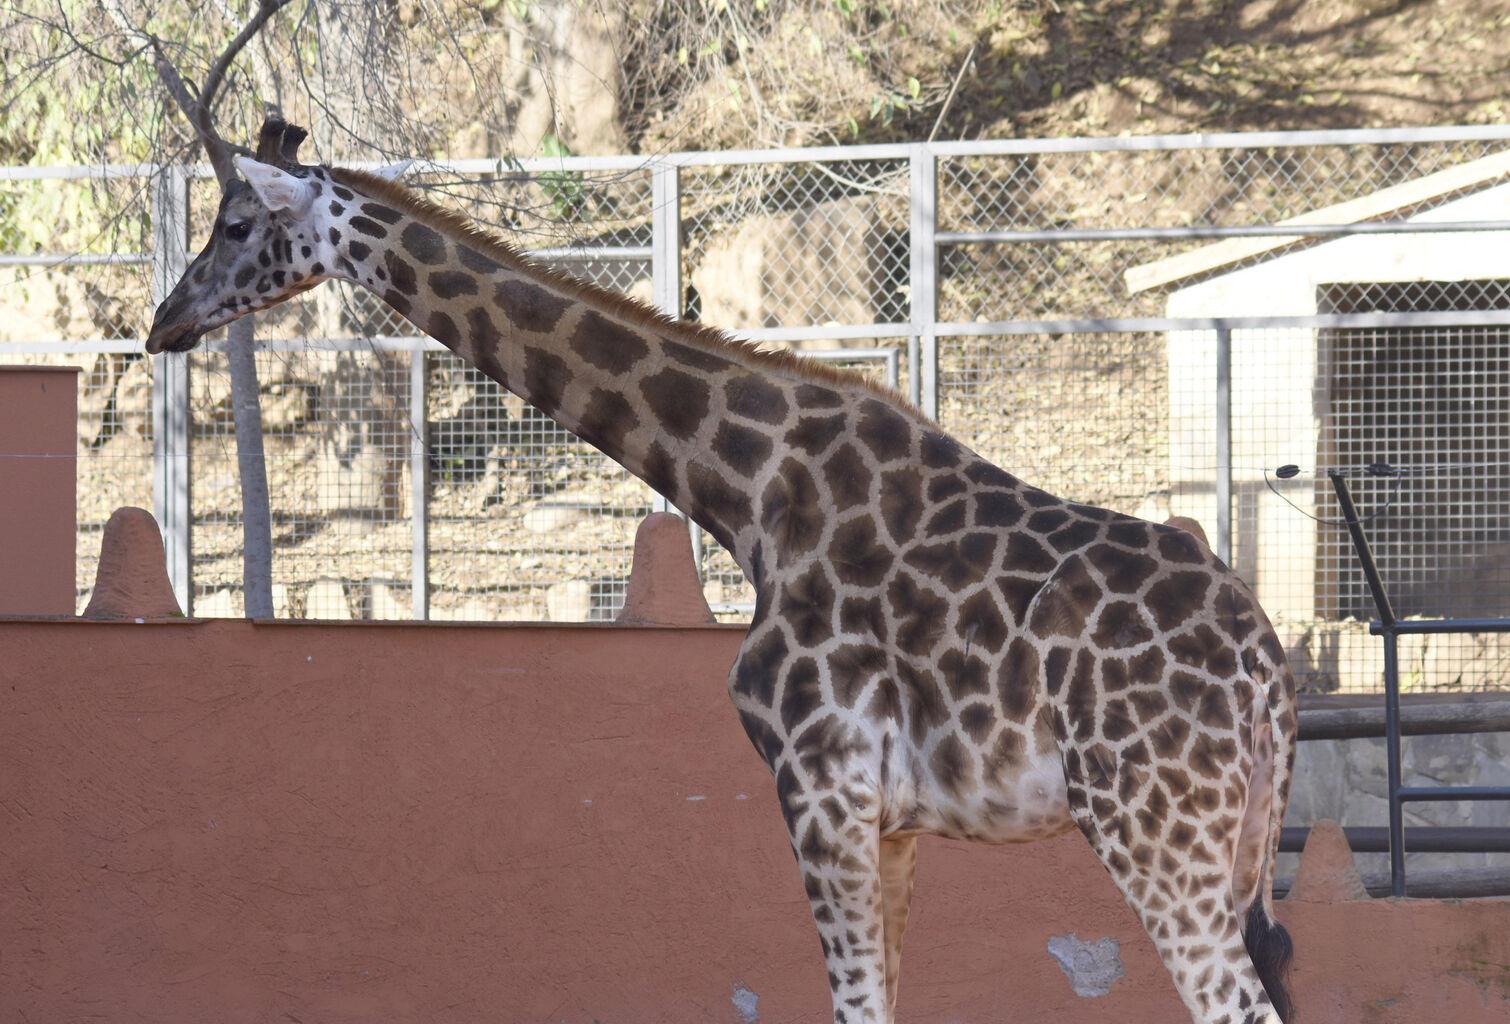 Las jirafas llegan por primera vez al Zoo de Córdoba